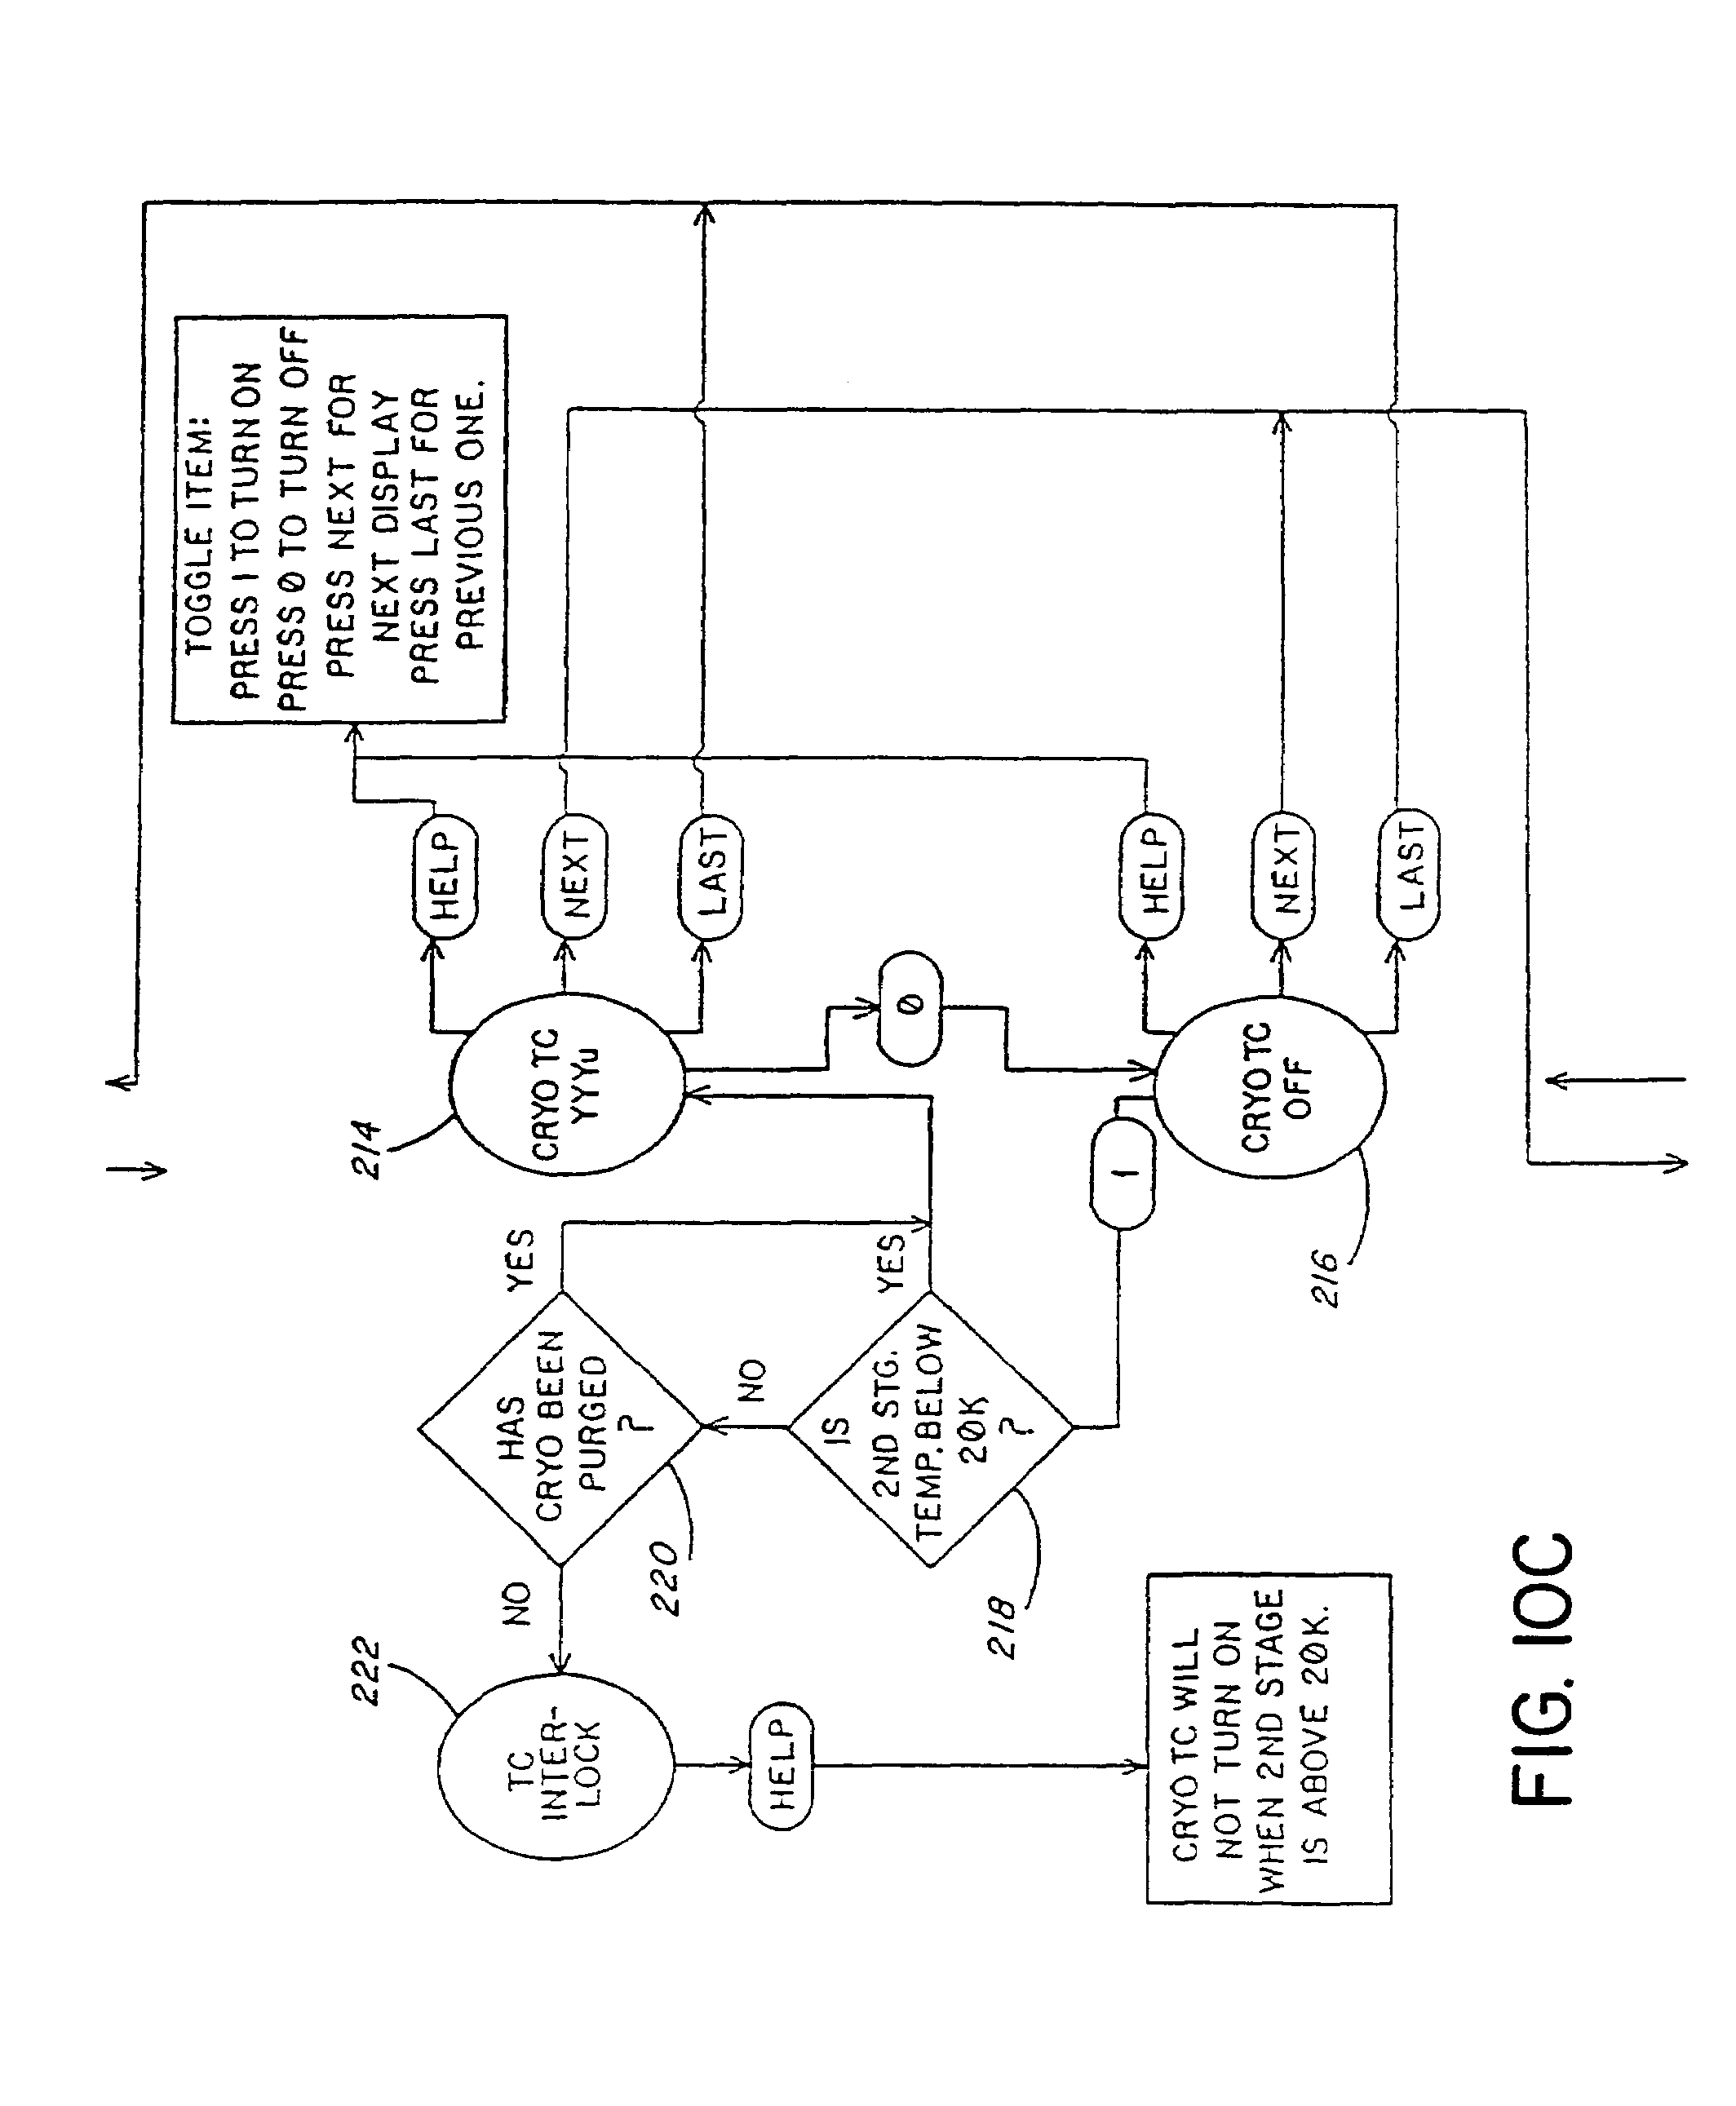 Vw Alternator Wiring Guide Vw Circuit Diagrams